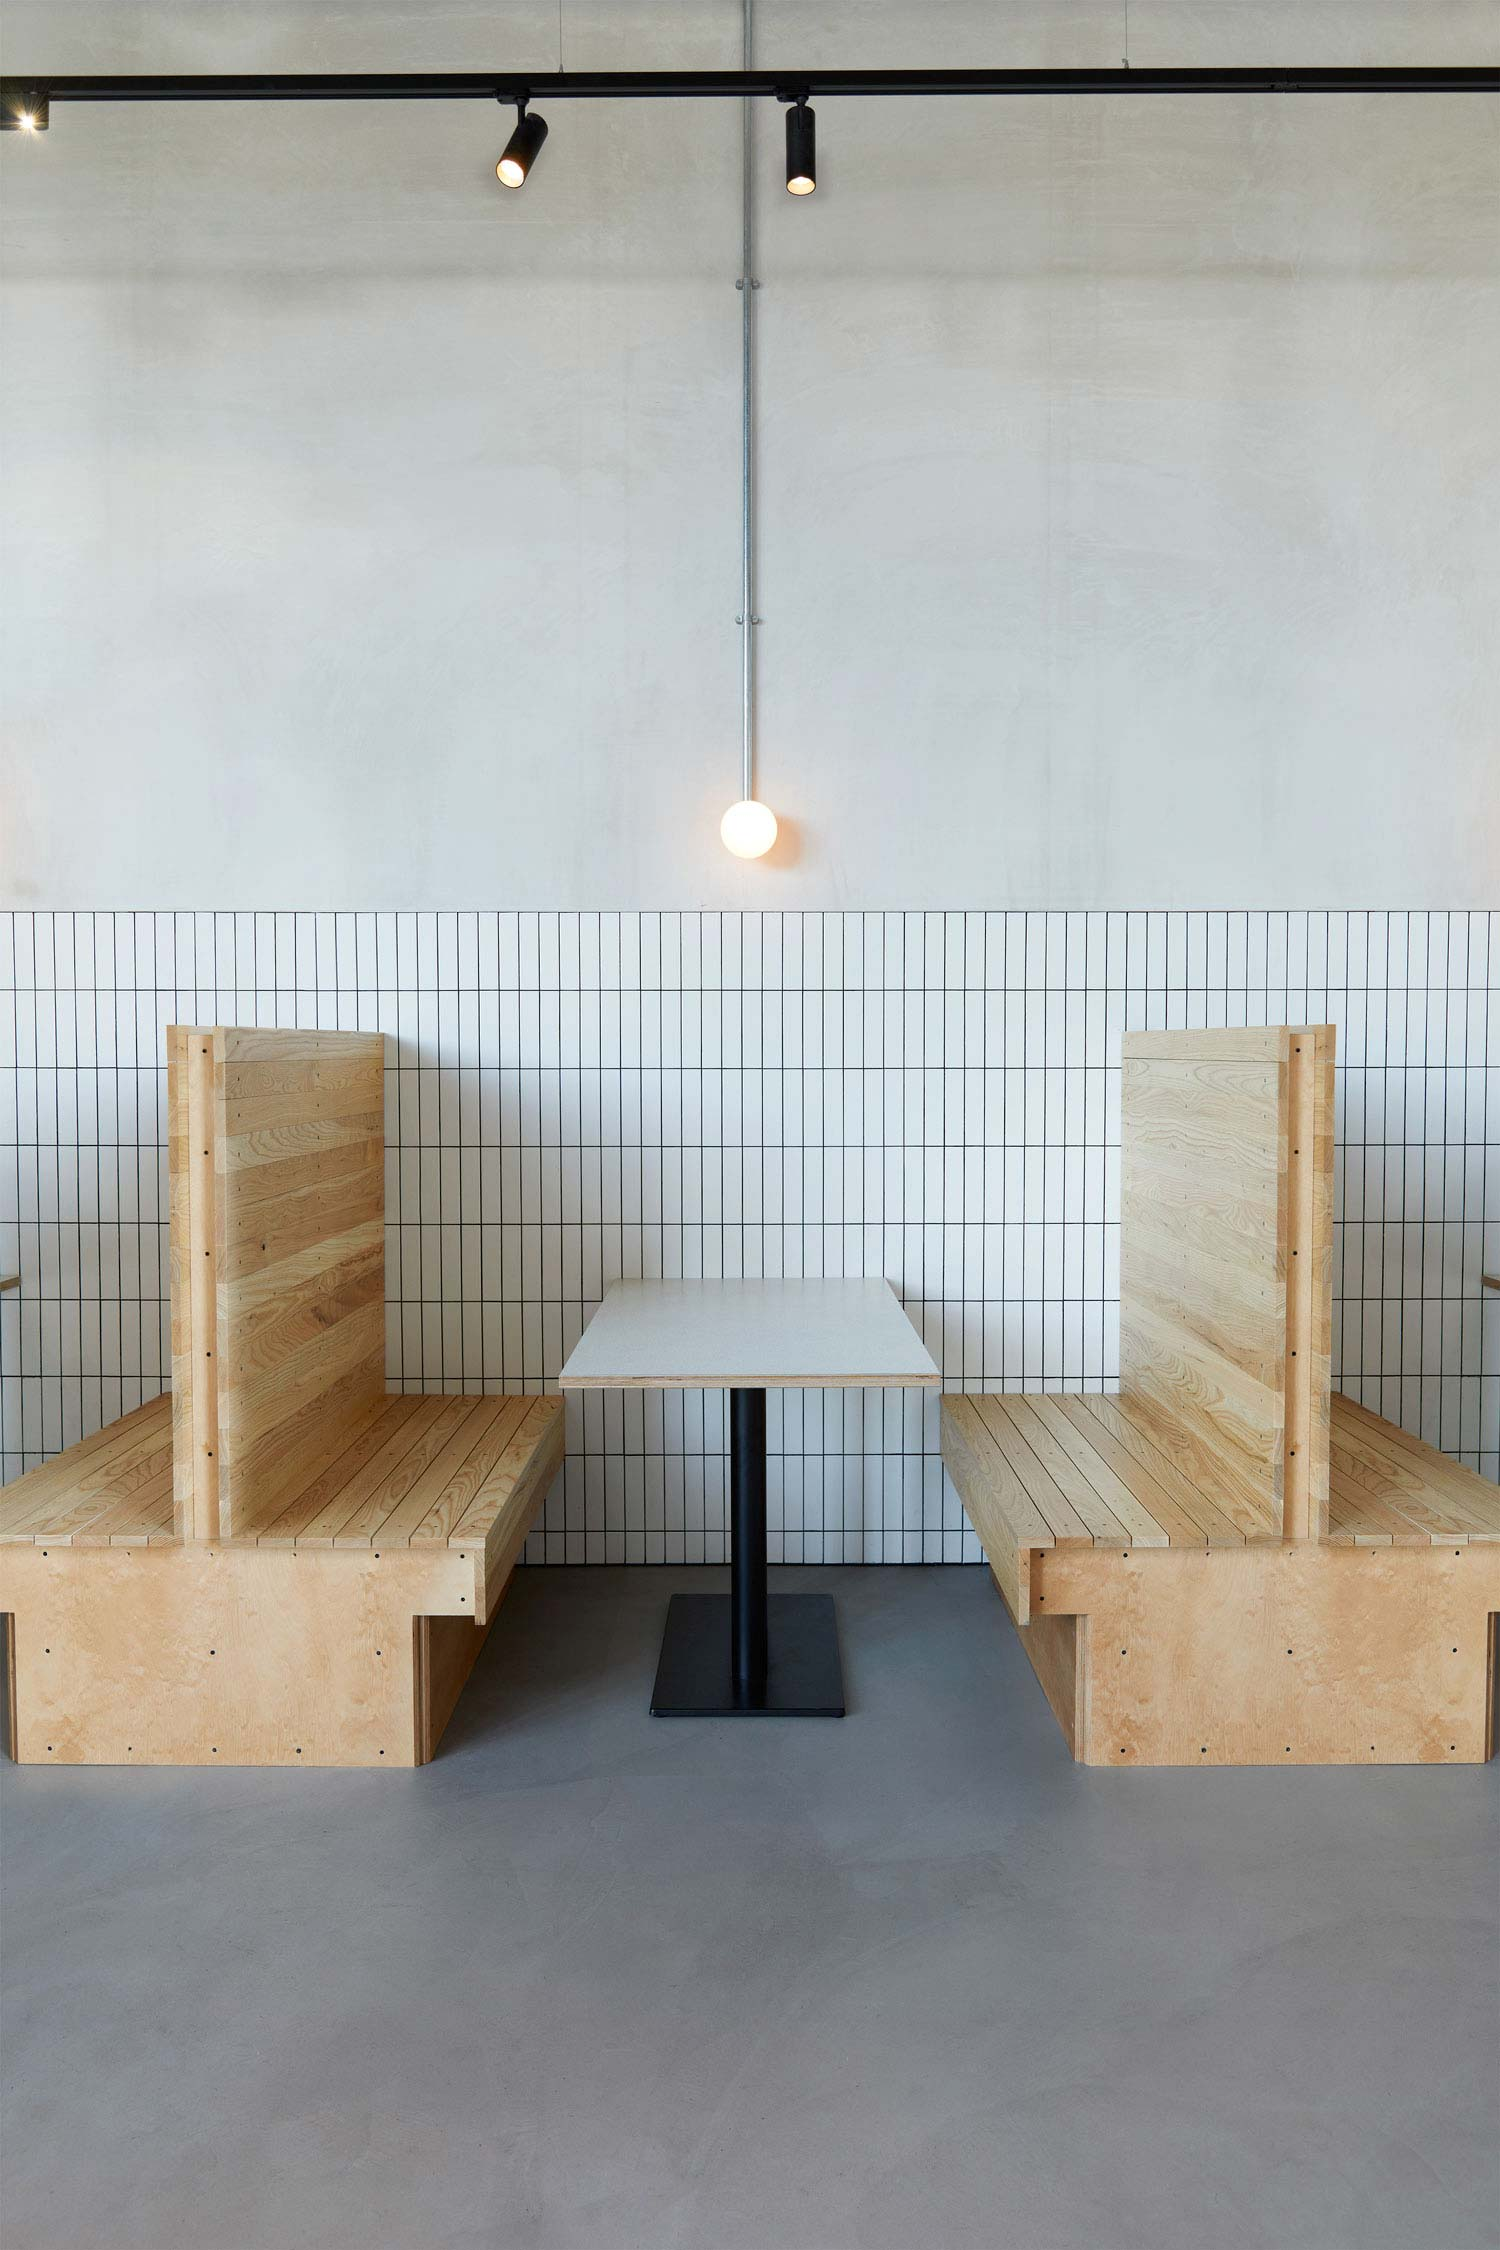 Architecture-London-Design-Freehaus-Workspace-Imperial-College-7.jpg